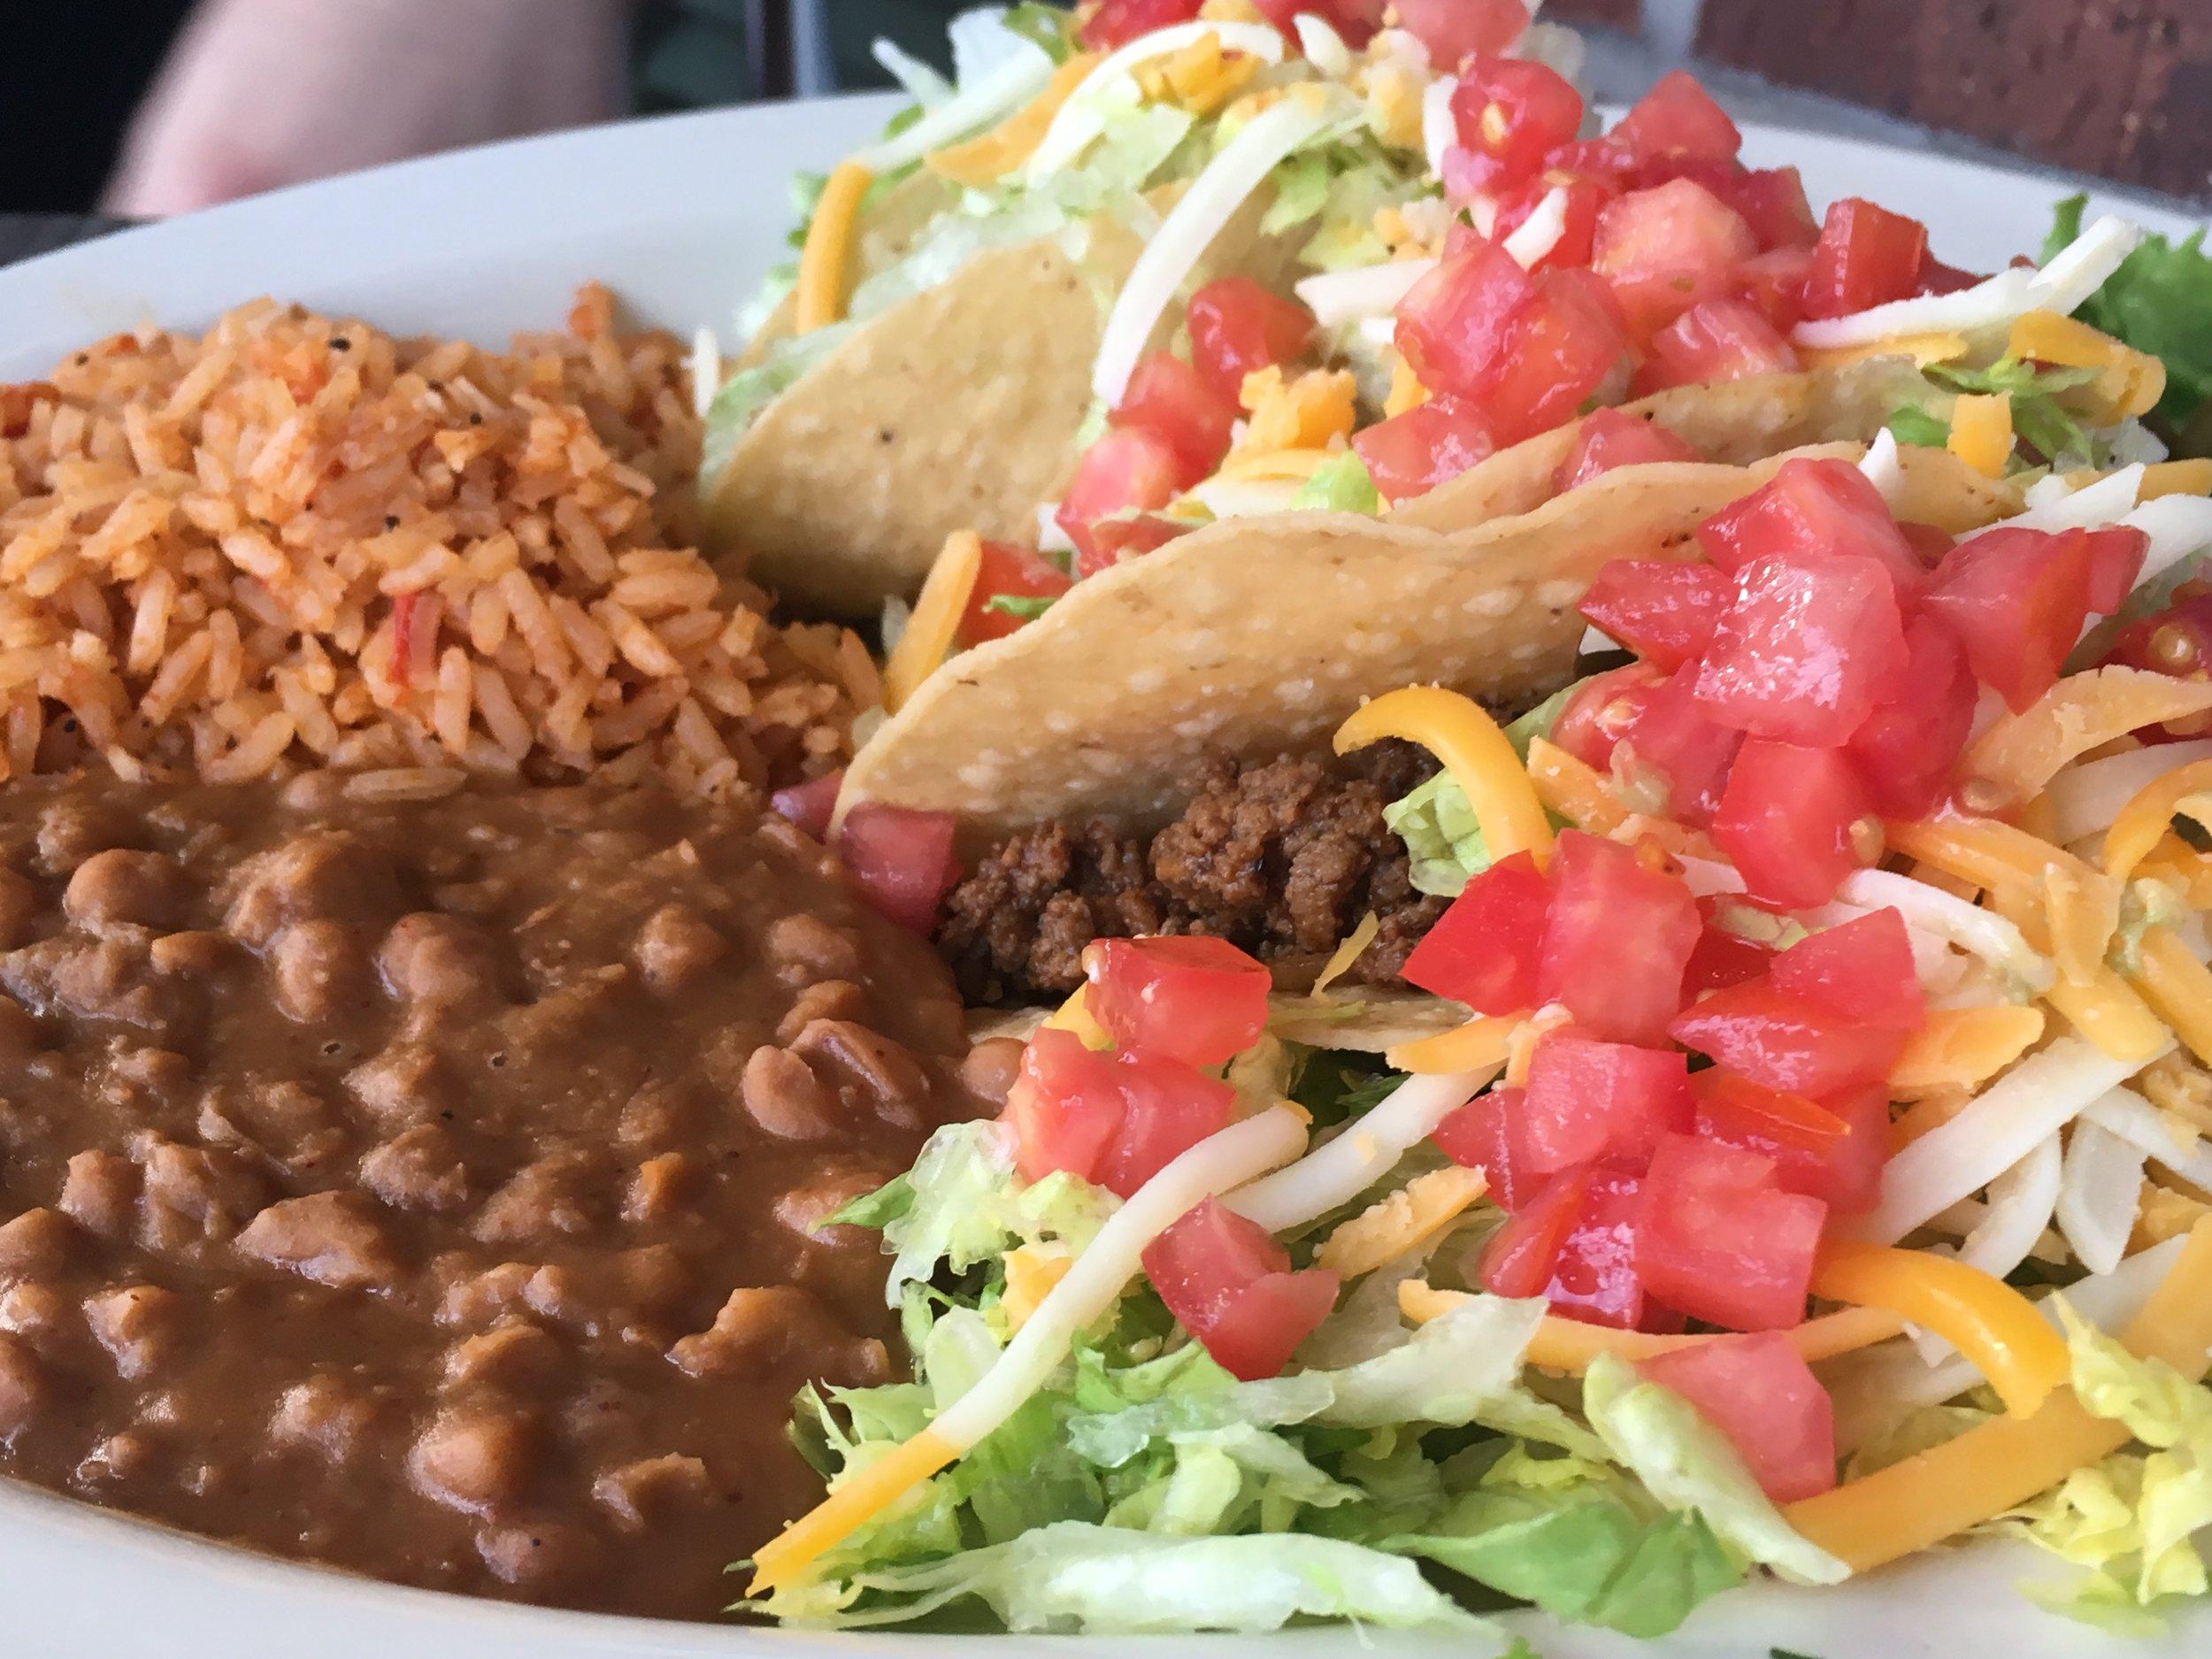 Chuys Tex Mex Doral Miami Crispy Tacos